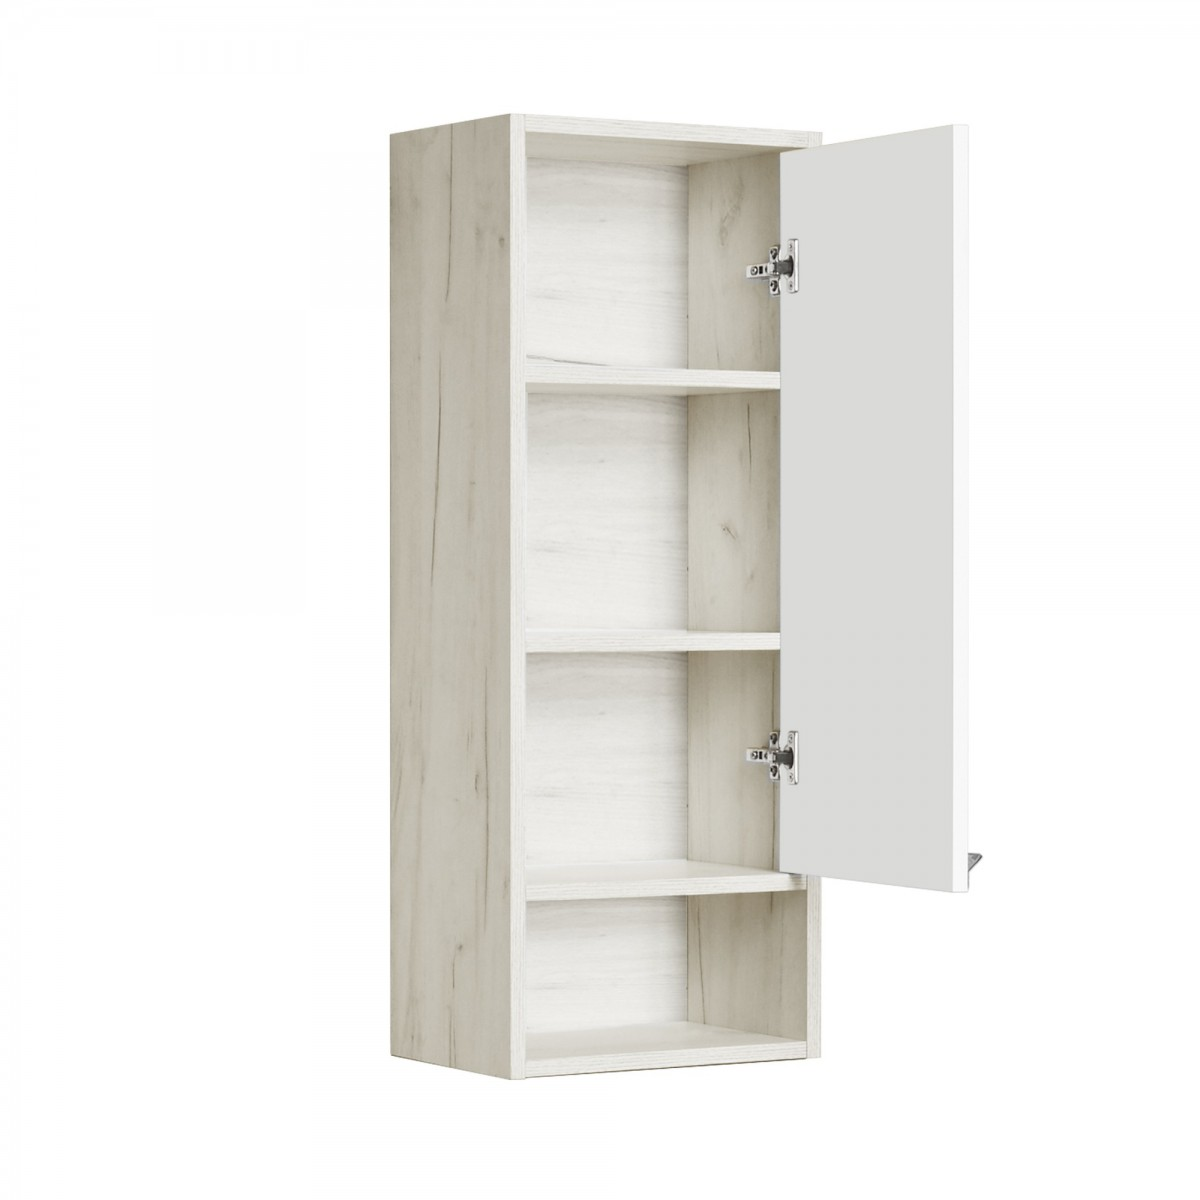 Шкаф одностворчатый Акватон Флай правый